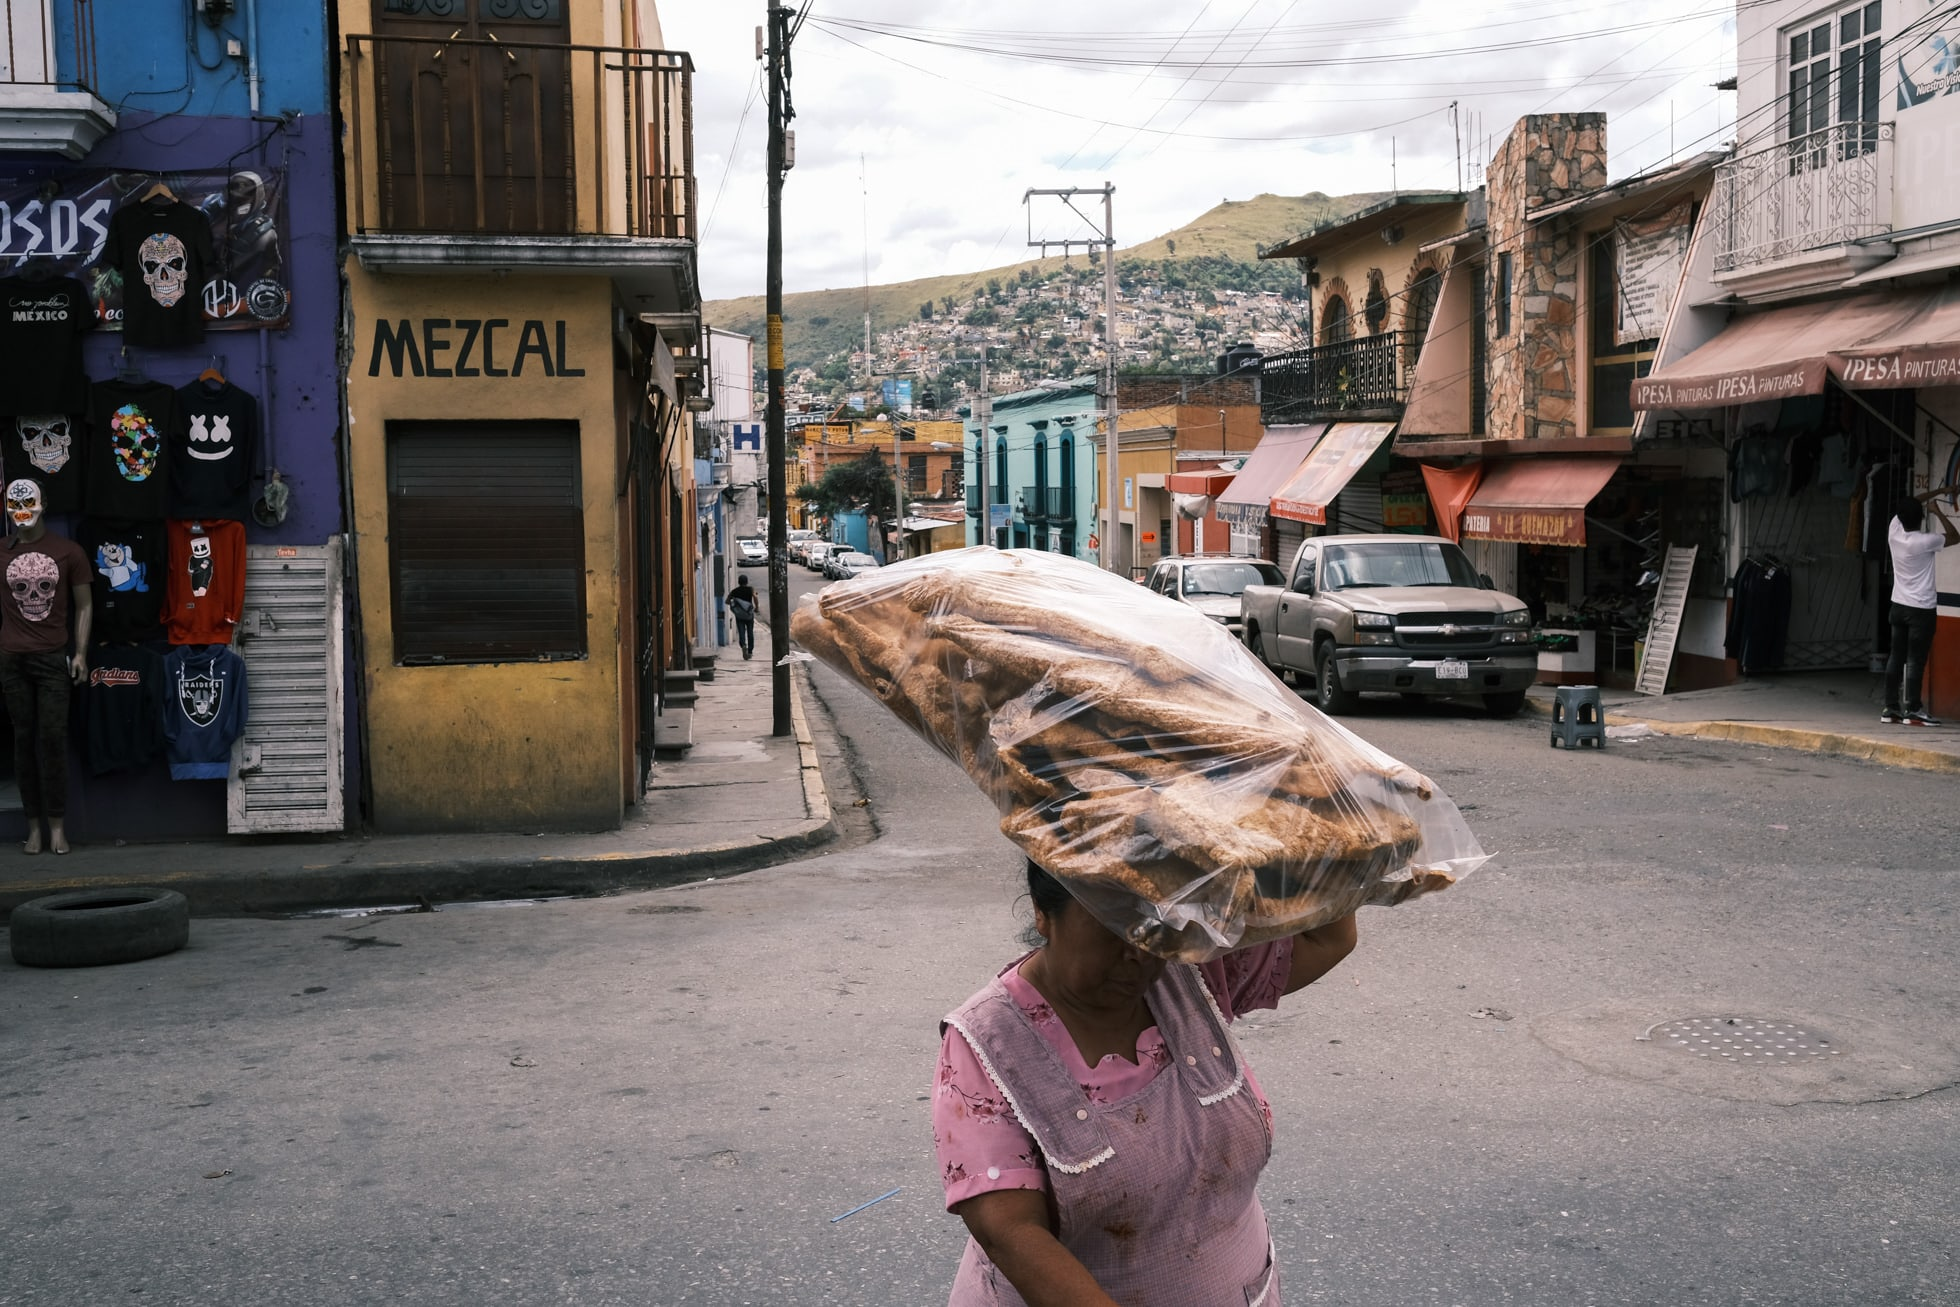 fujifilm-x-pro3-mexico-street-photography-22